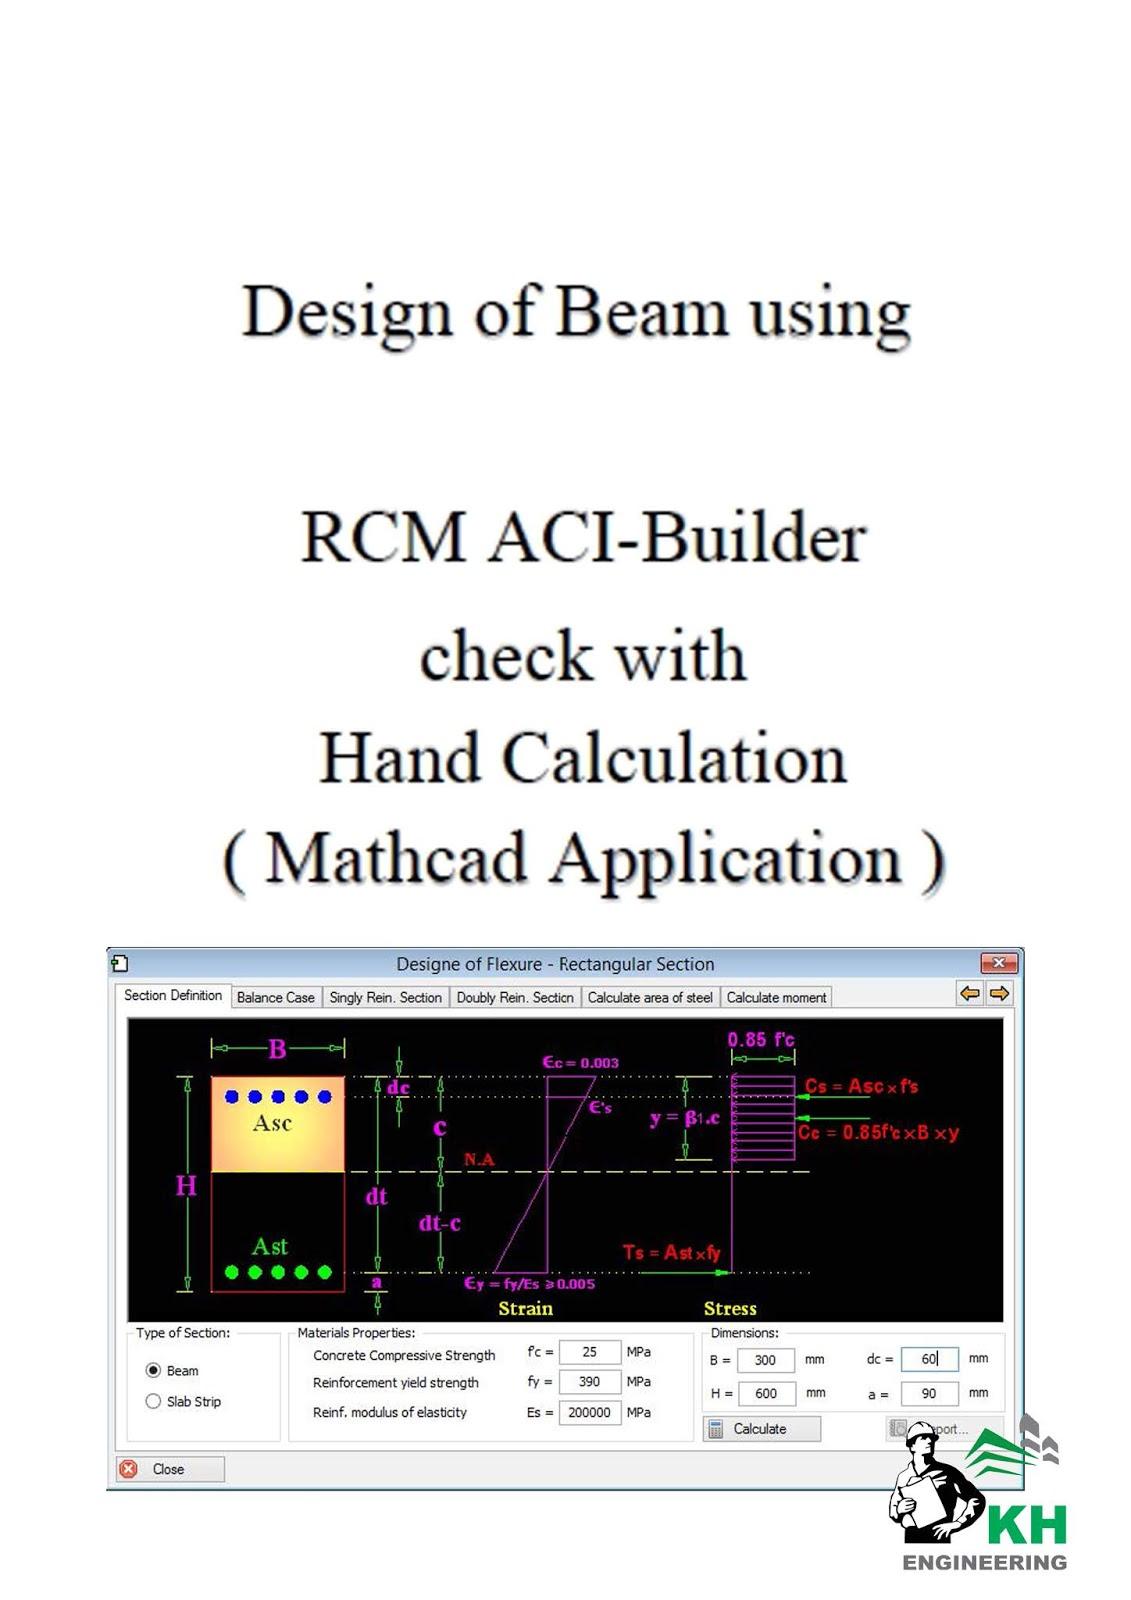 Design of Beam using RCM ACI-Builder - KH Engineering